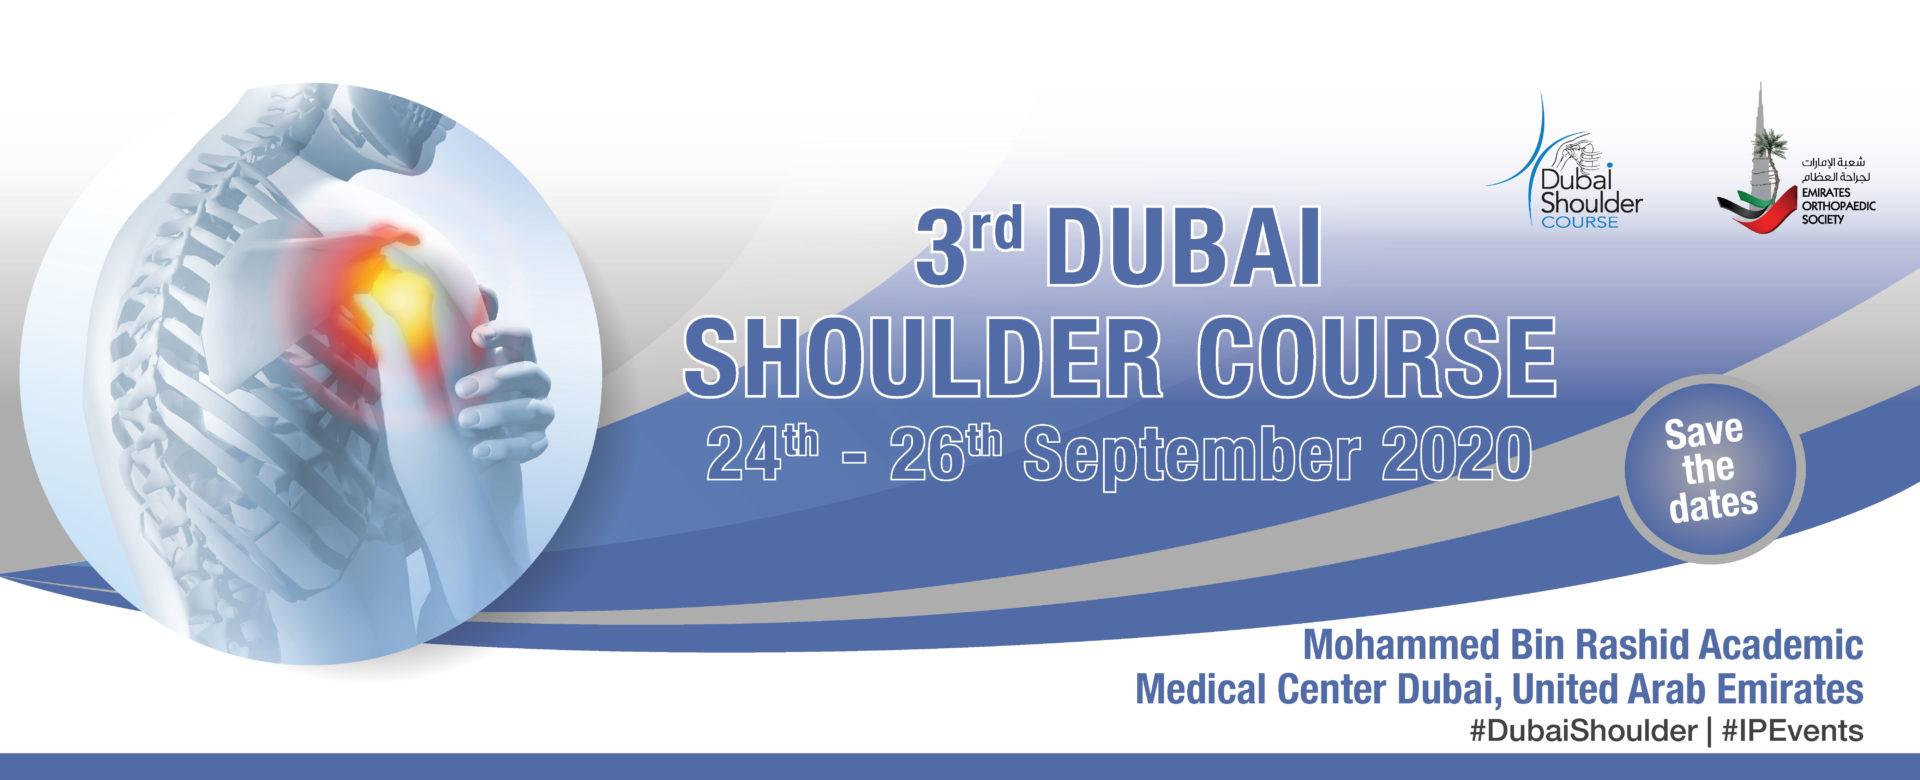 New_Banner_Dubai_Shoulder-01